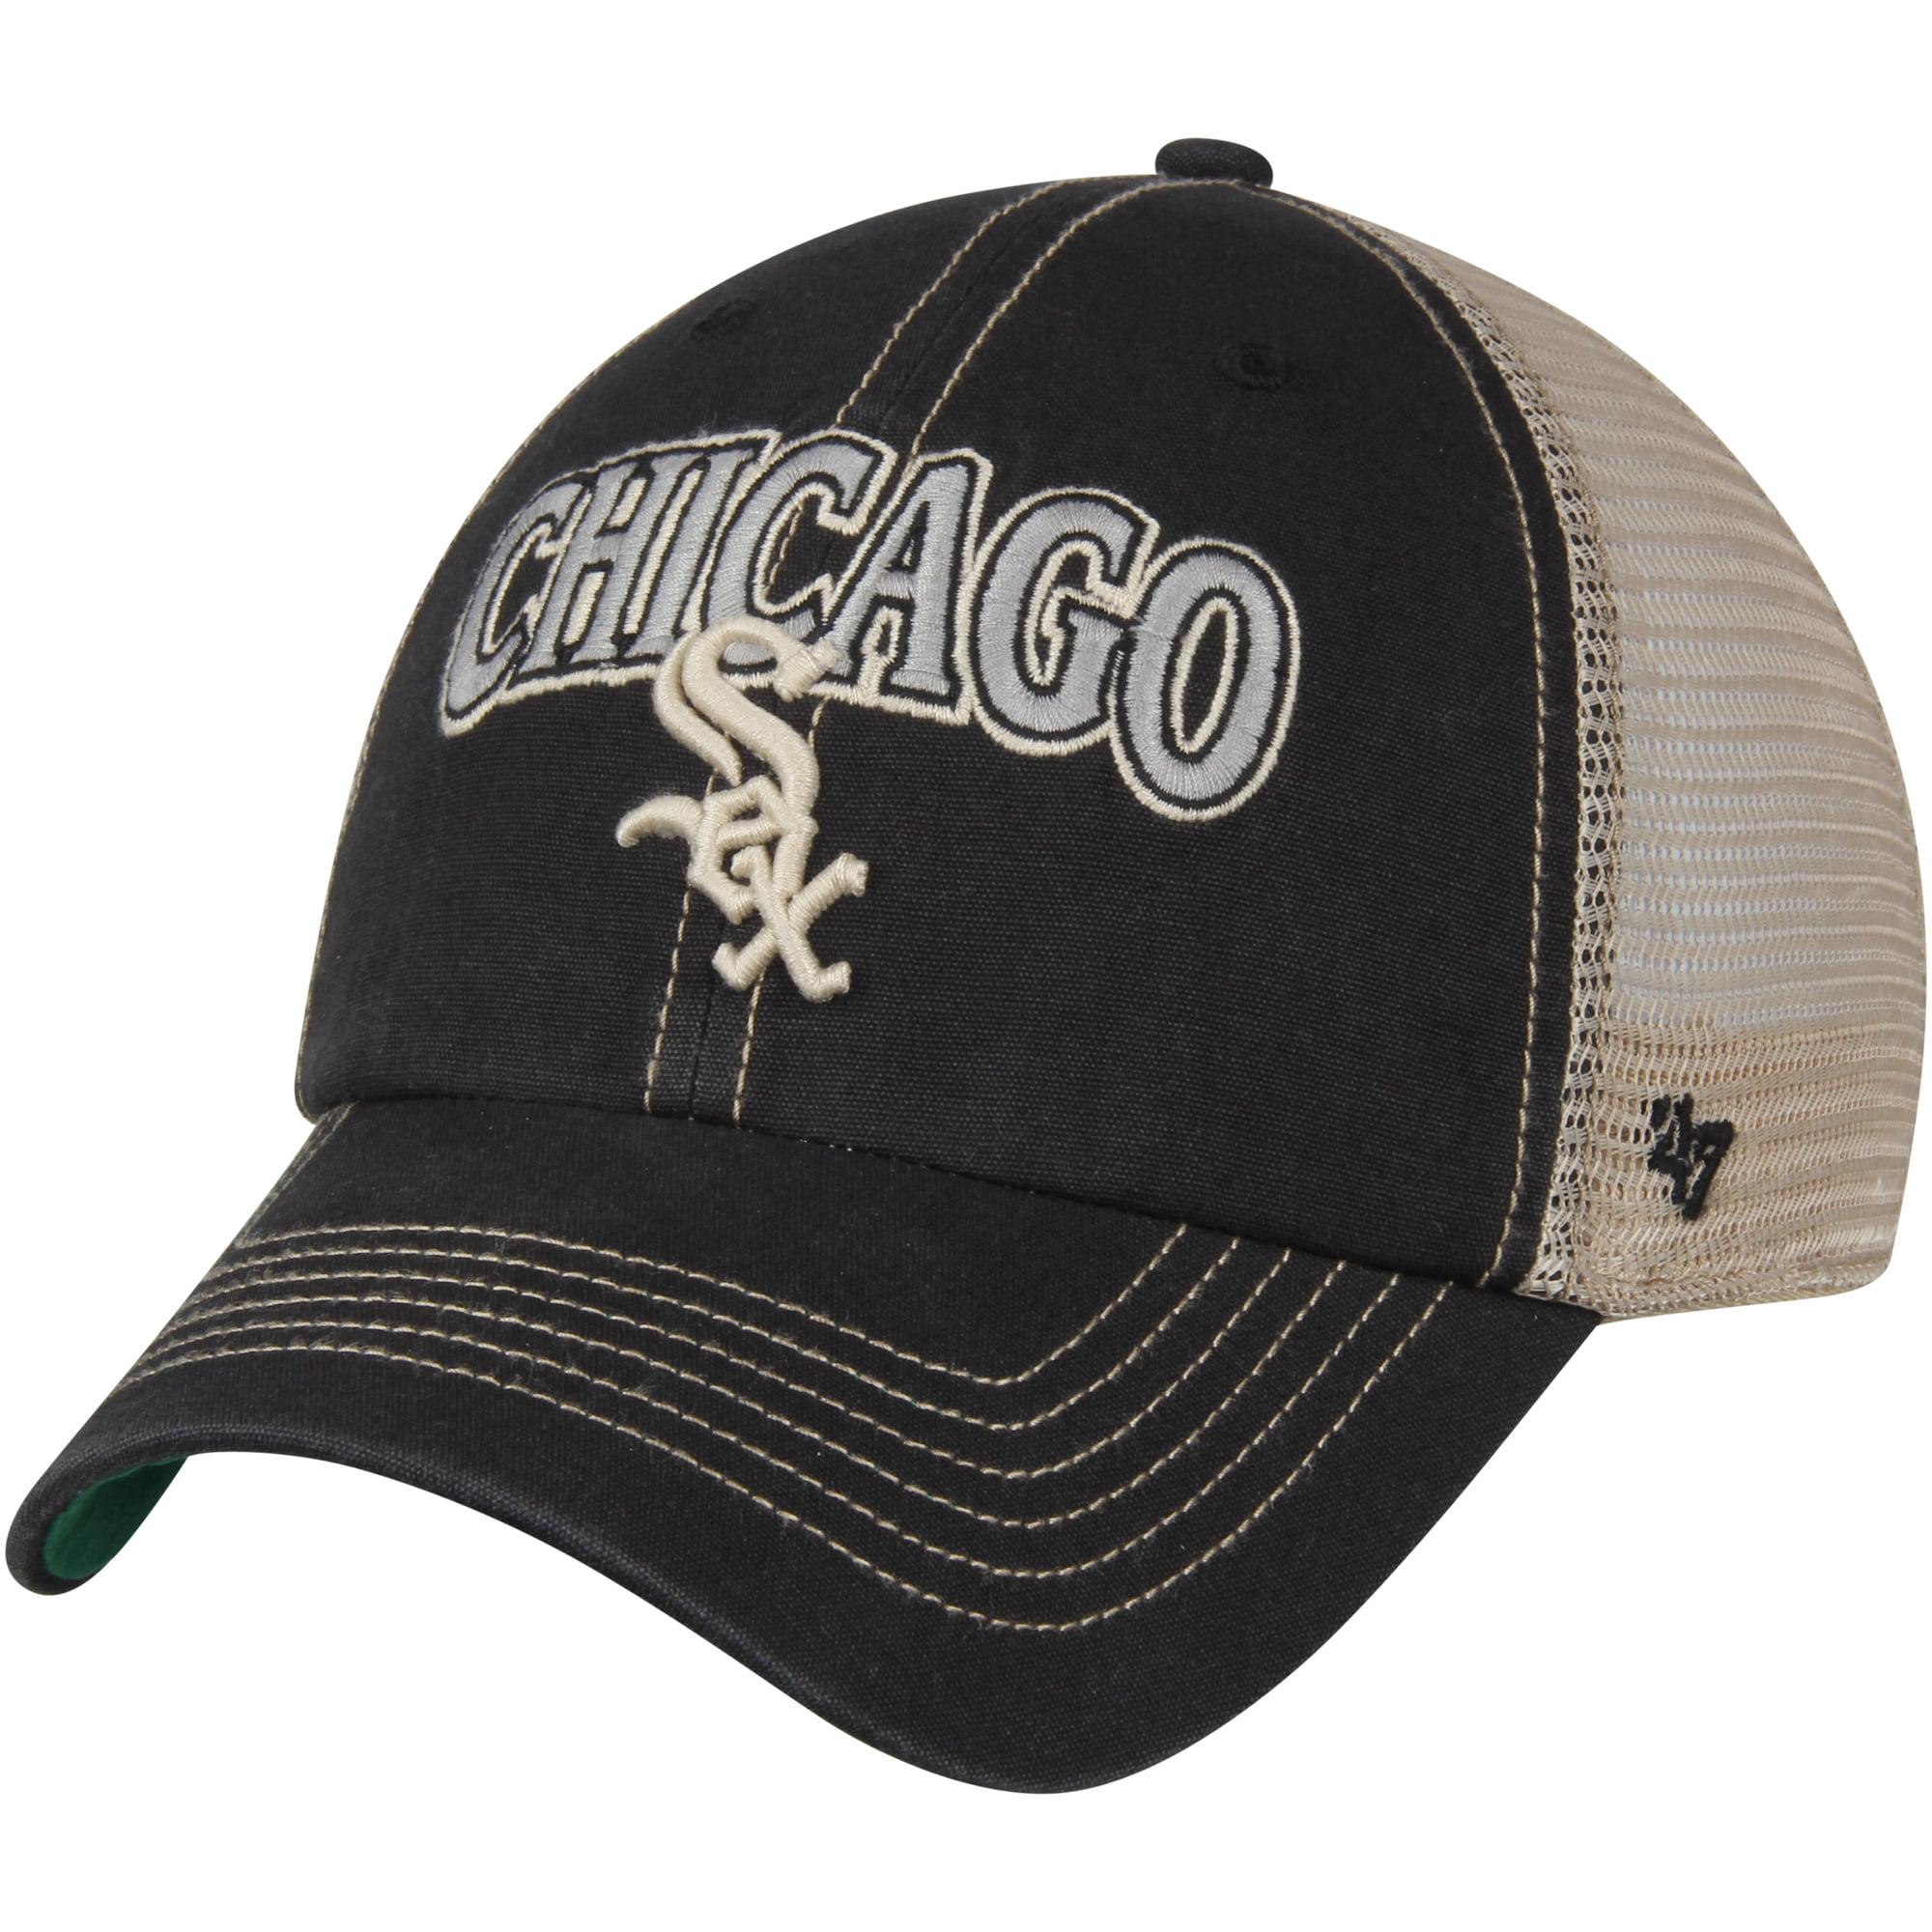 Chicago White Sox '47 Tuscaloosa Clean Up Adjustable Hat - Black/Natural - OSFA